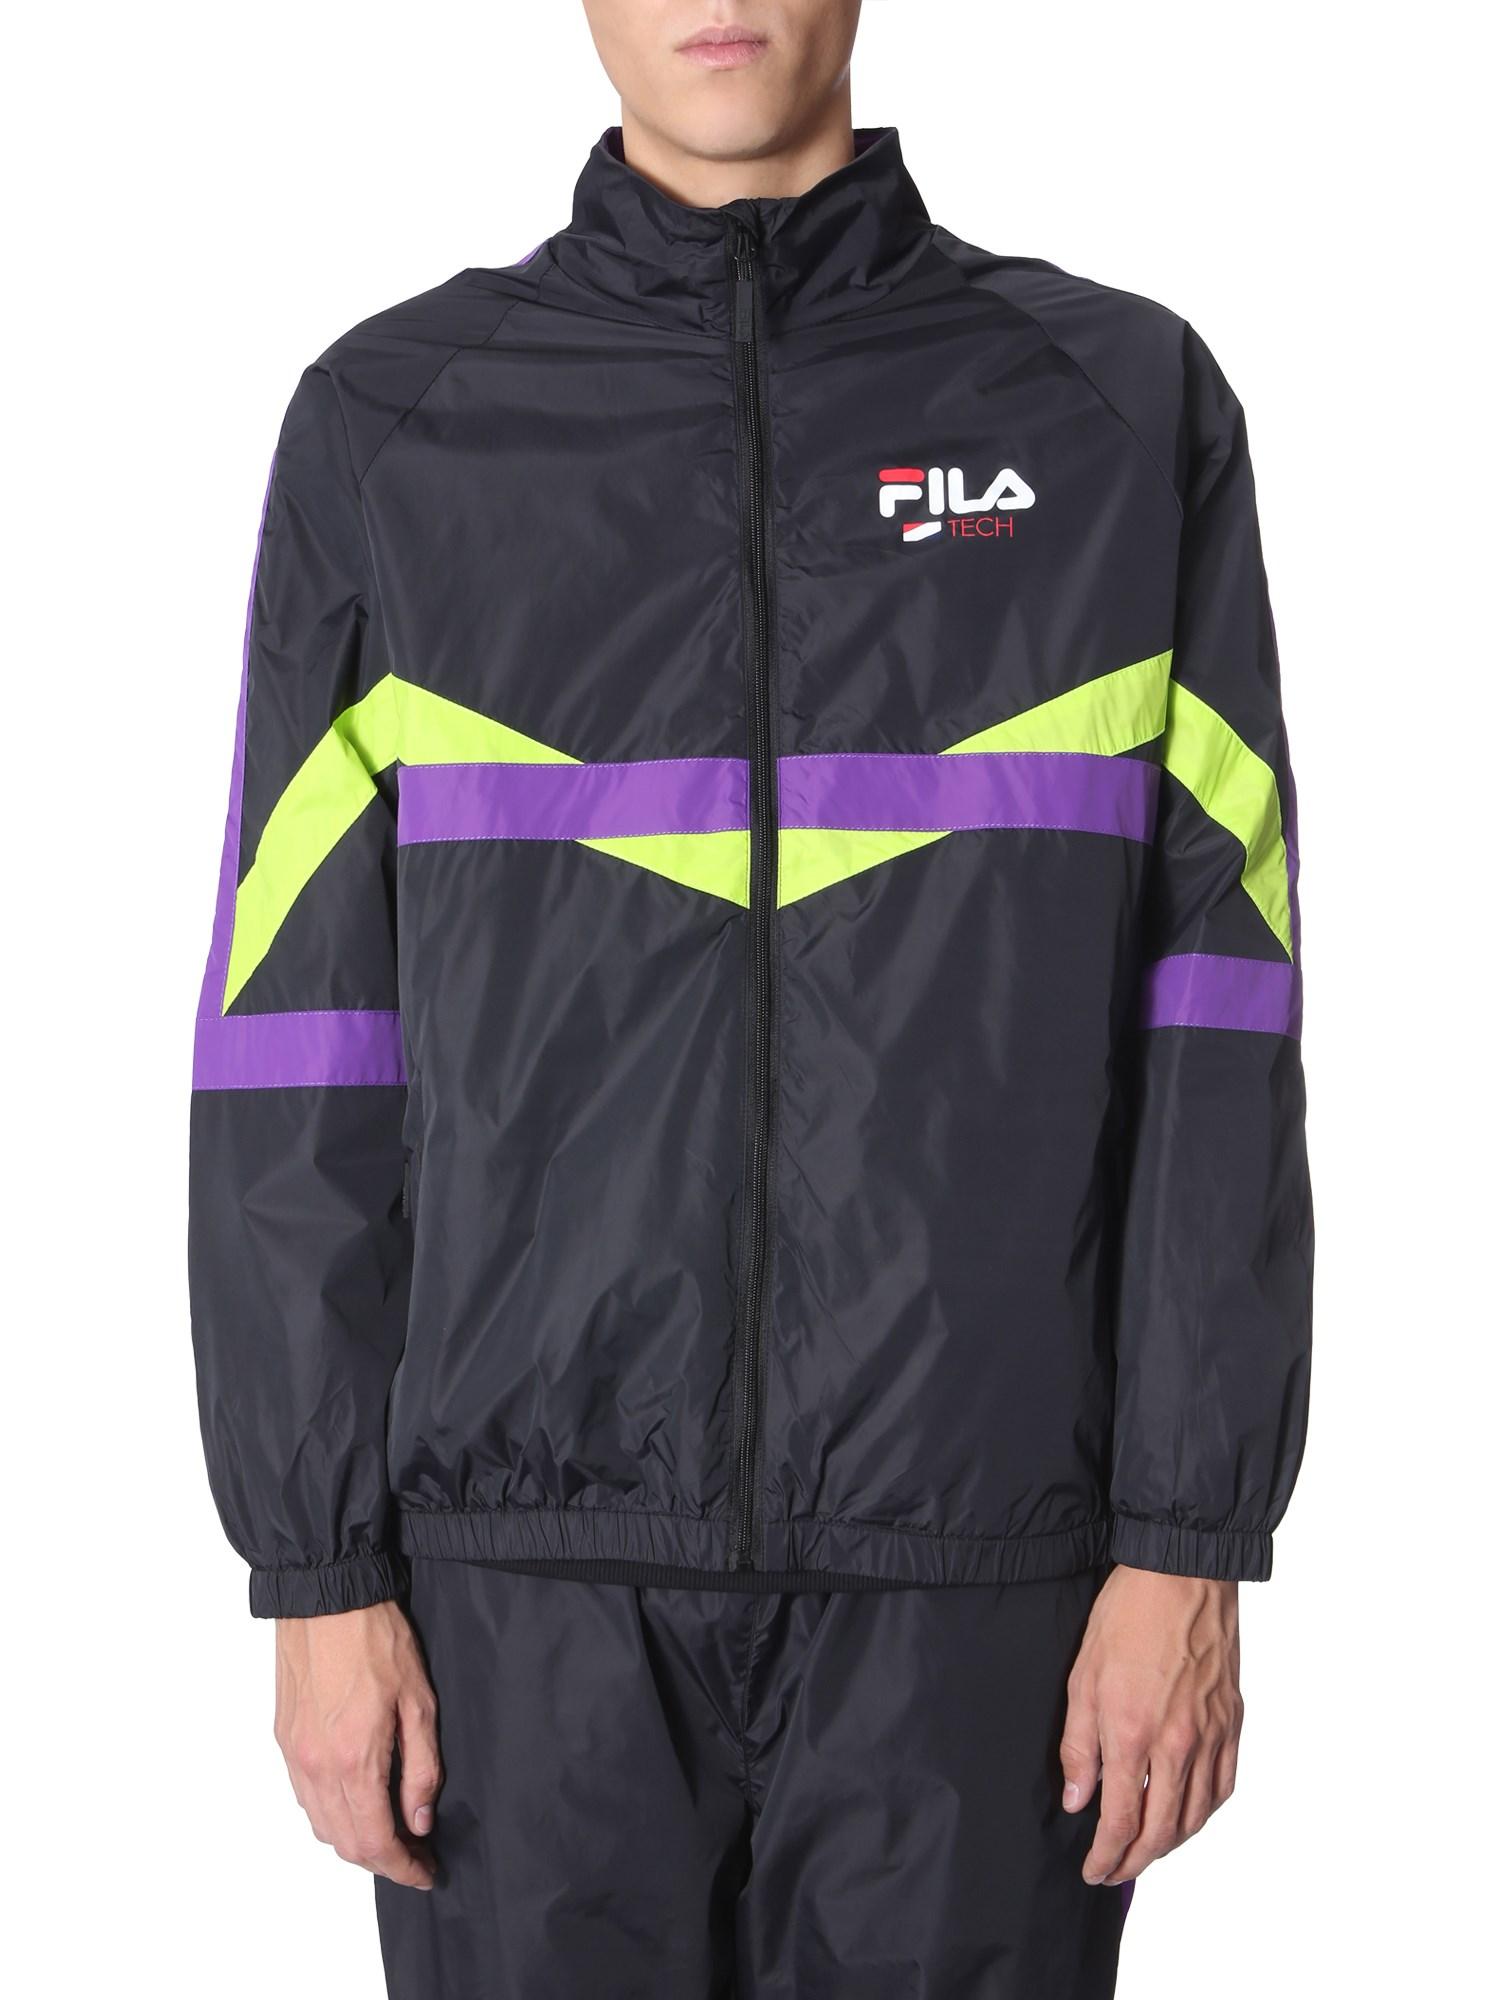 fila track sweatshirt with zip